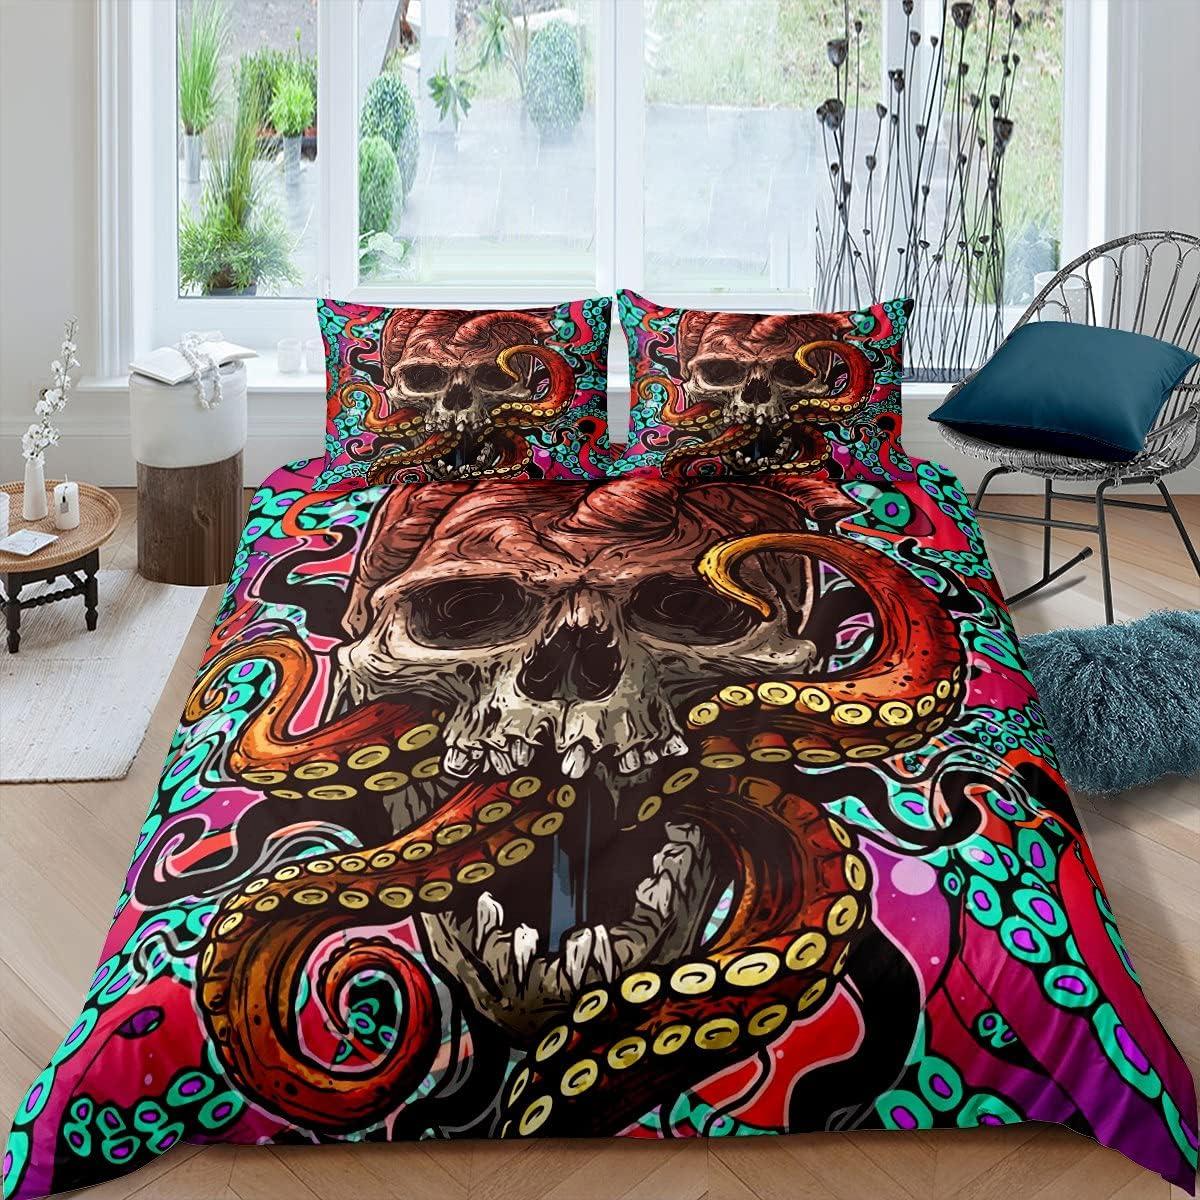 Manfei Sugar Skull Bedding Set 3pcs 全品最安値に挑戦 Boys Kids Teens for Octopus 早割クーポン